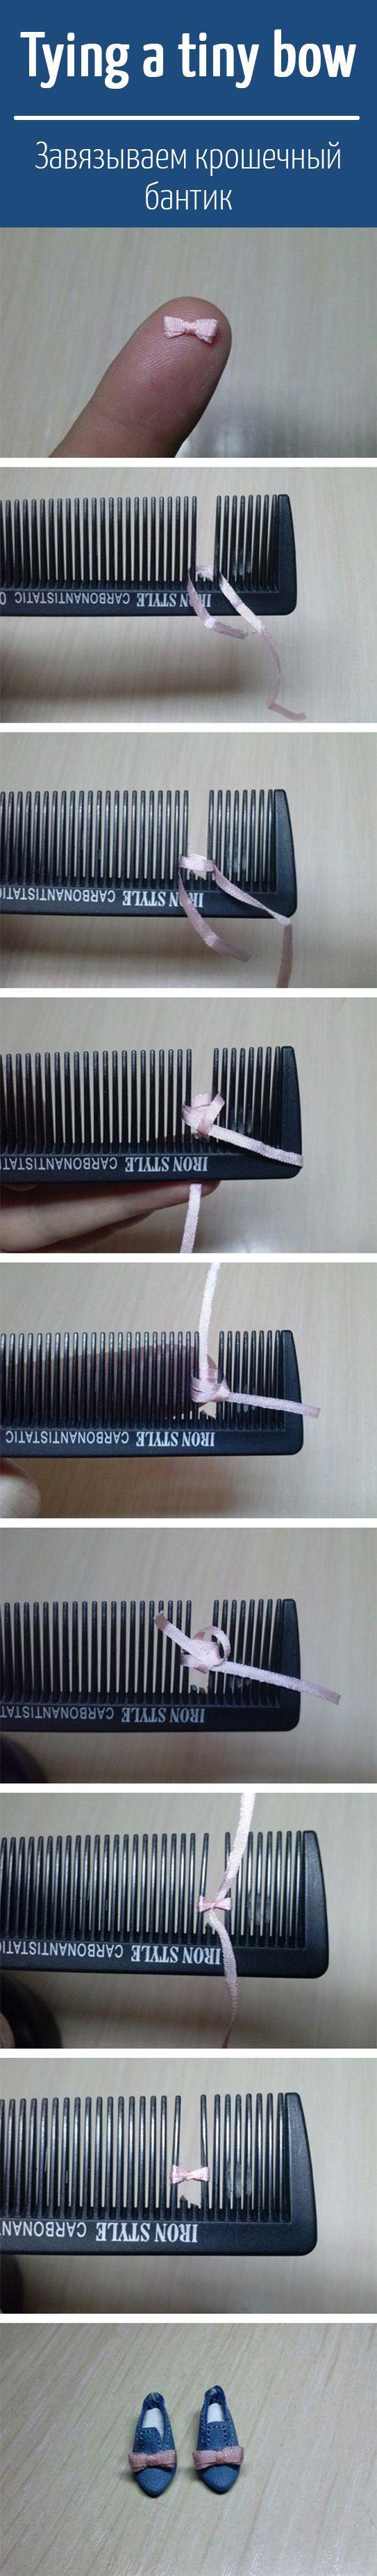 Tying a tiny bow tutorial / Завязываем миниатюрный бантик - online lingerie, lingerie lingerie, vintage intimates *sponsored